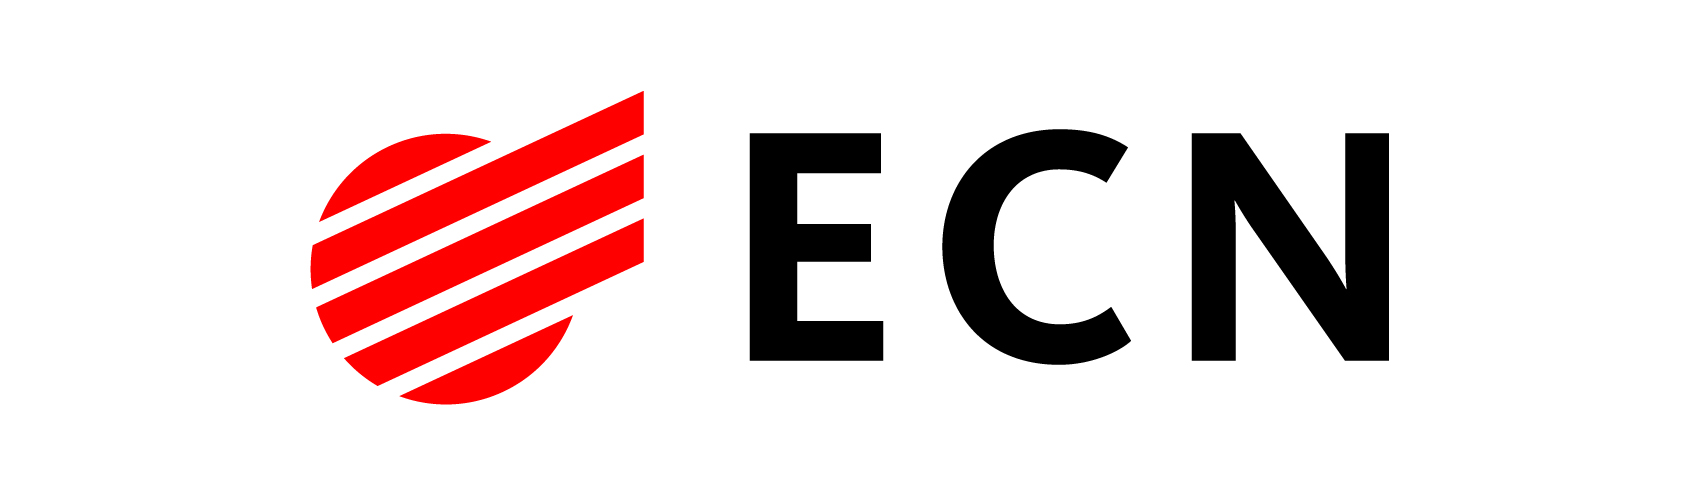 Ecn netherlands